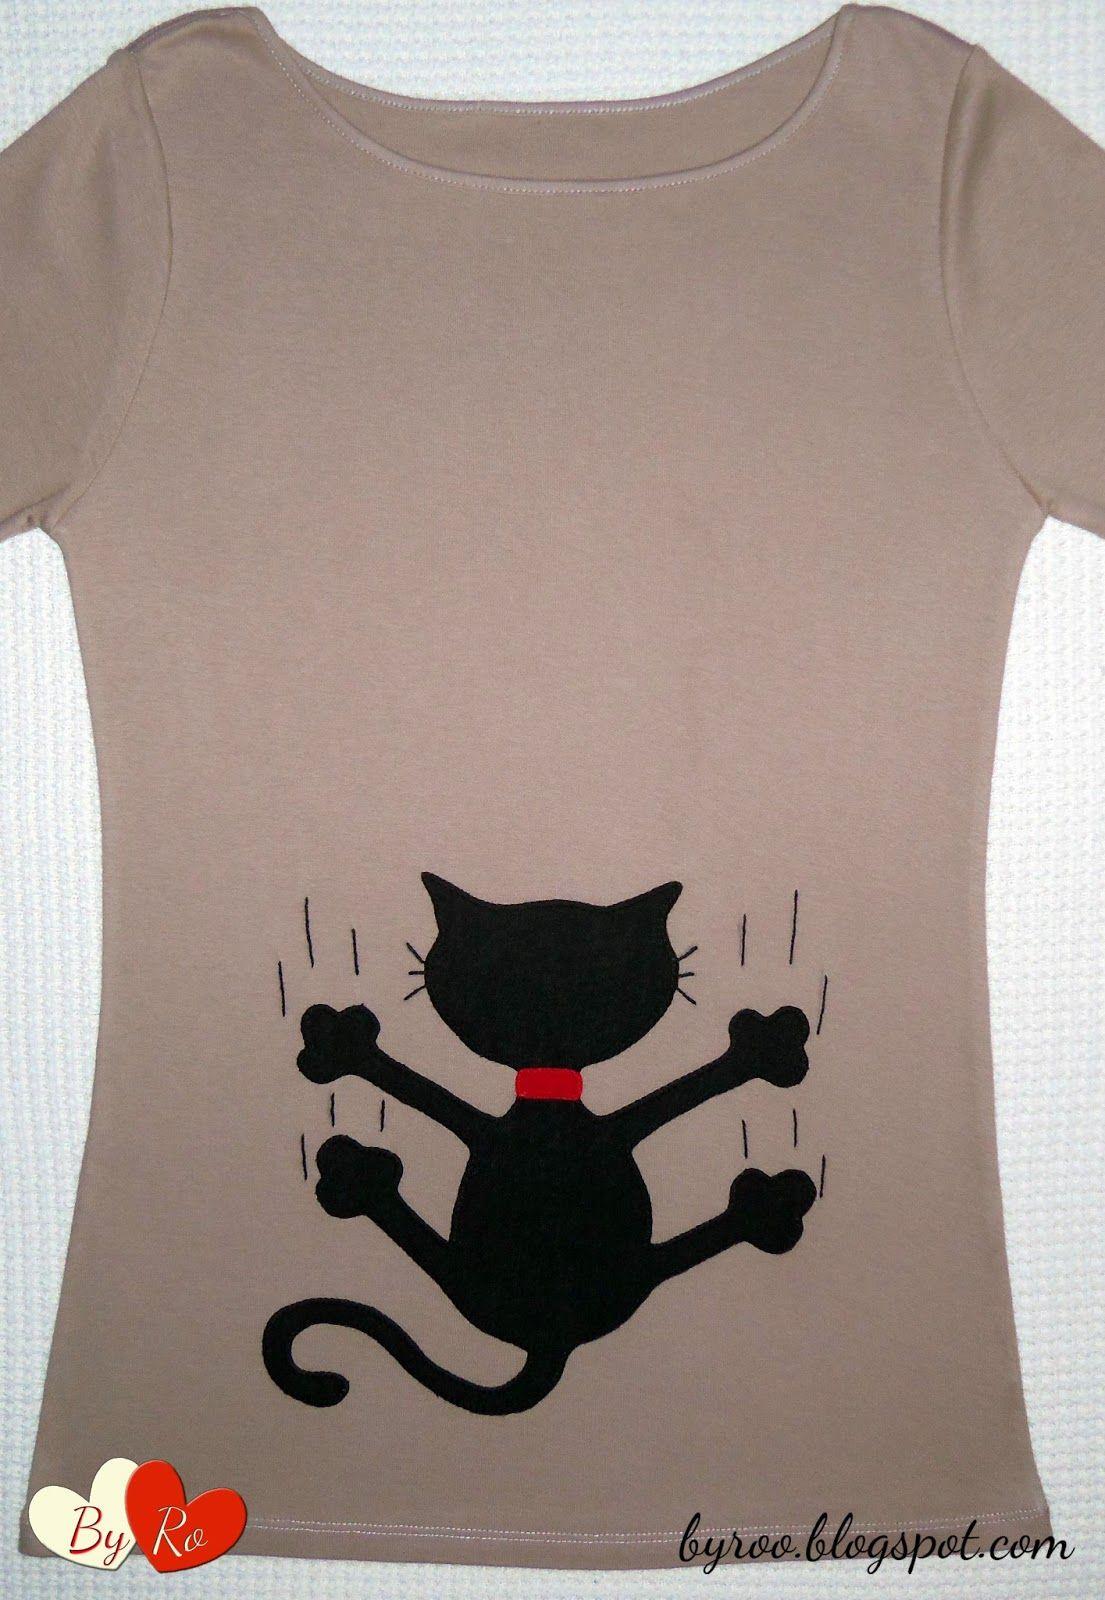 By ro camisetas patchwork animales pinteres for Aplicaciones decoradas